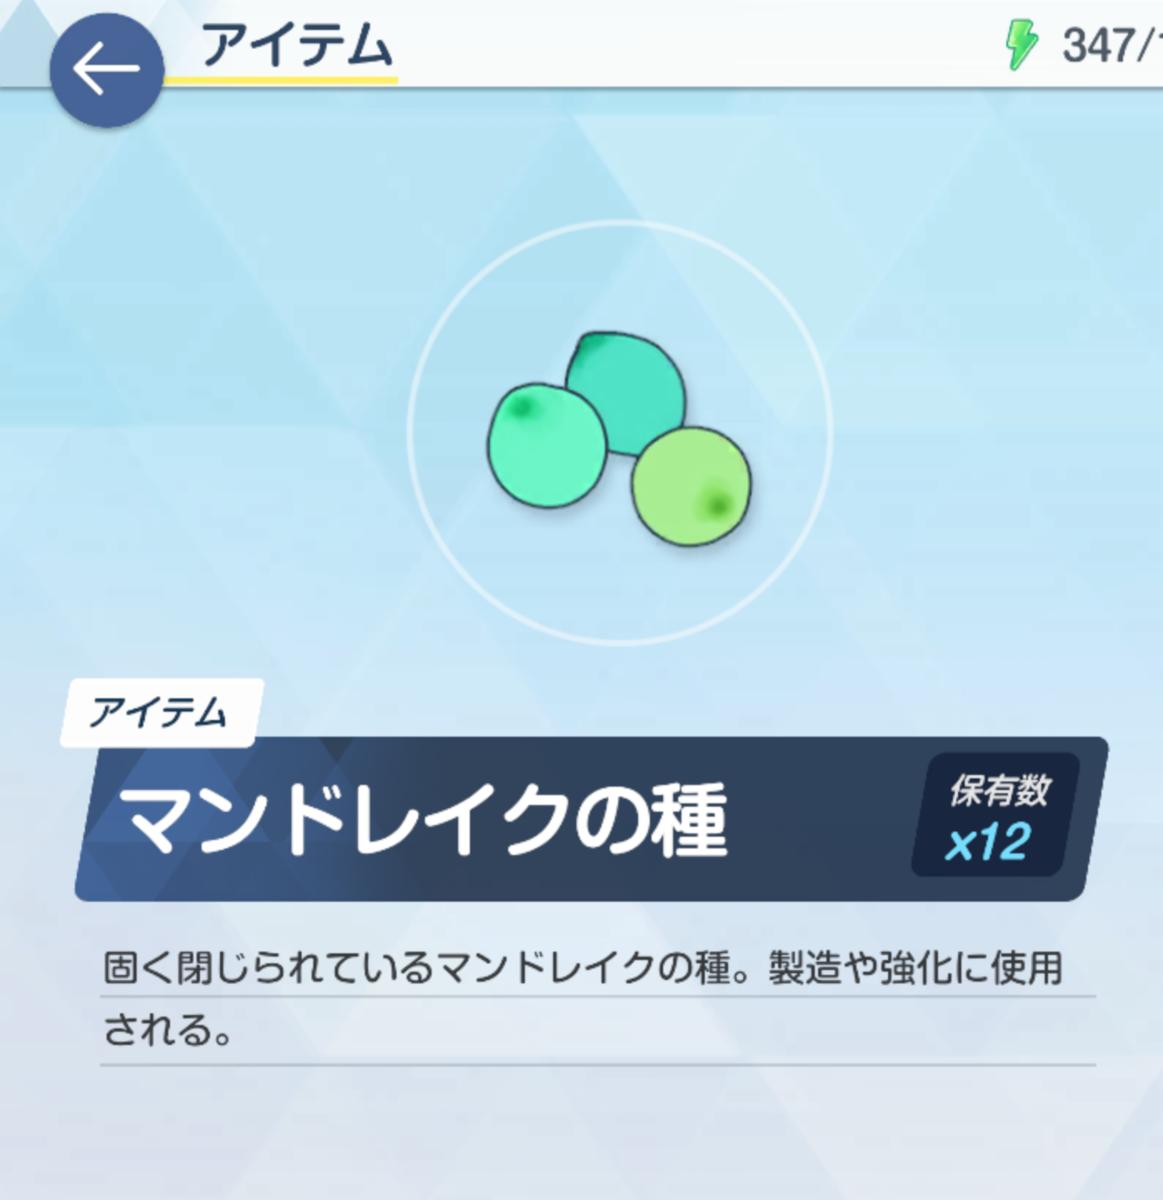 f:id:ichi1223:20210223033007p:plain